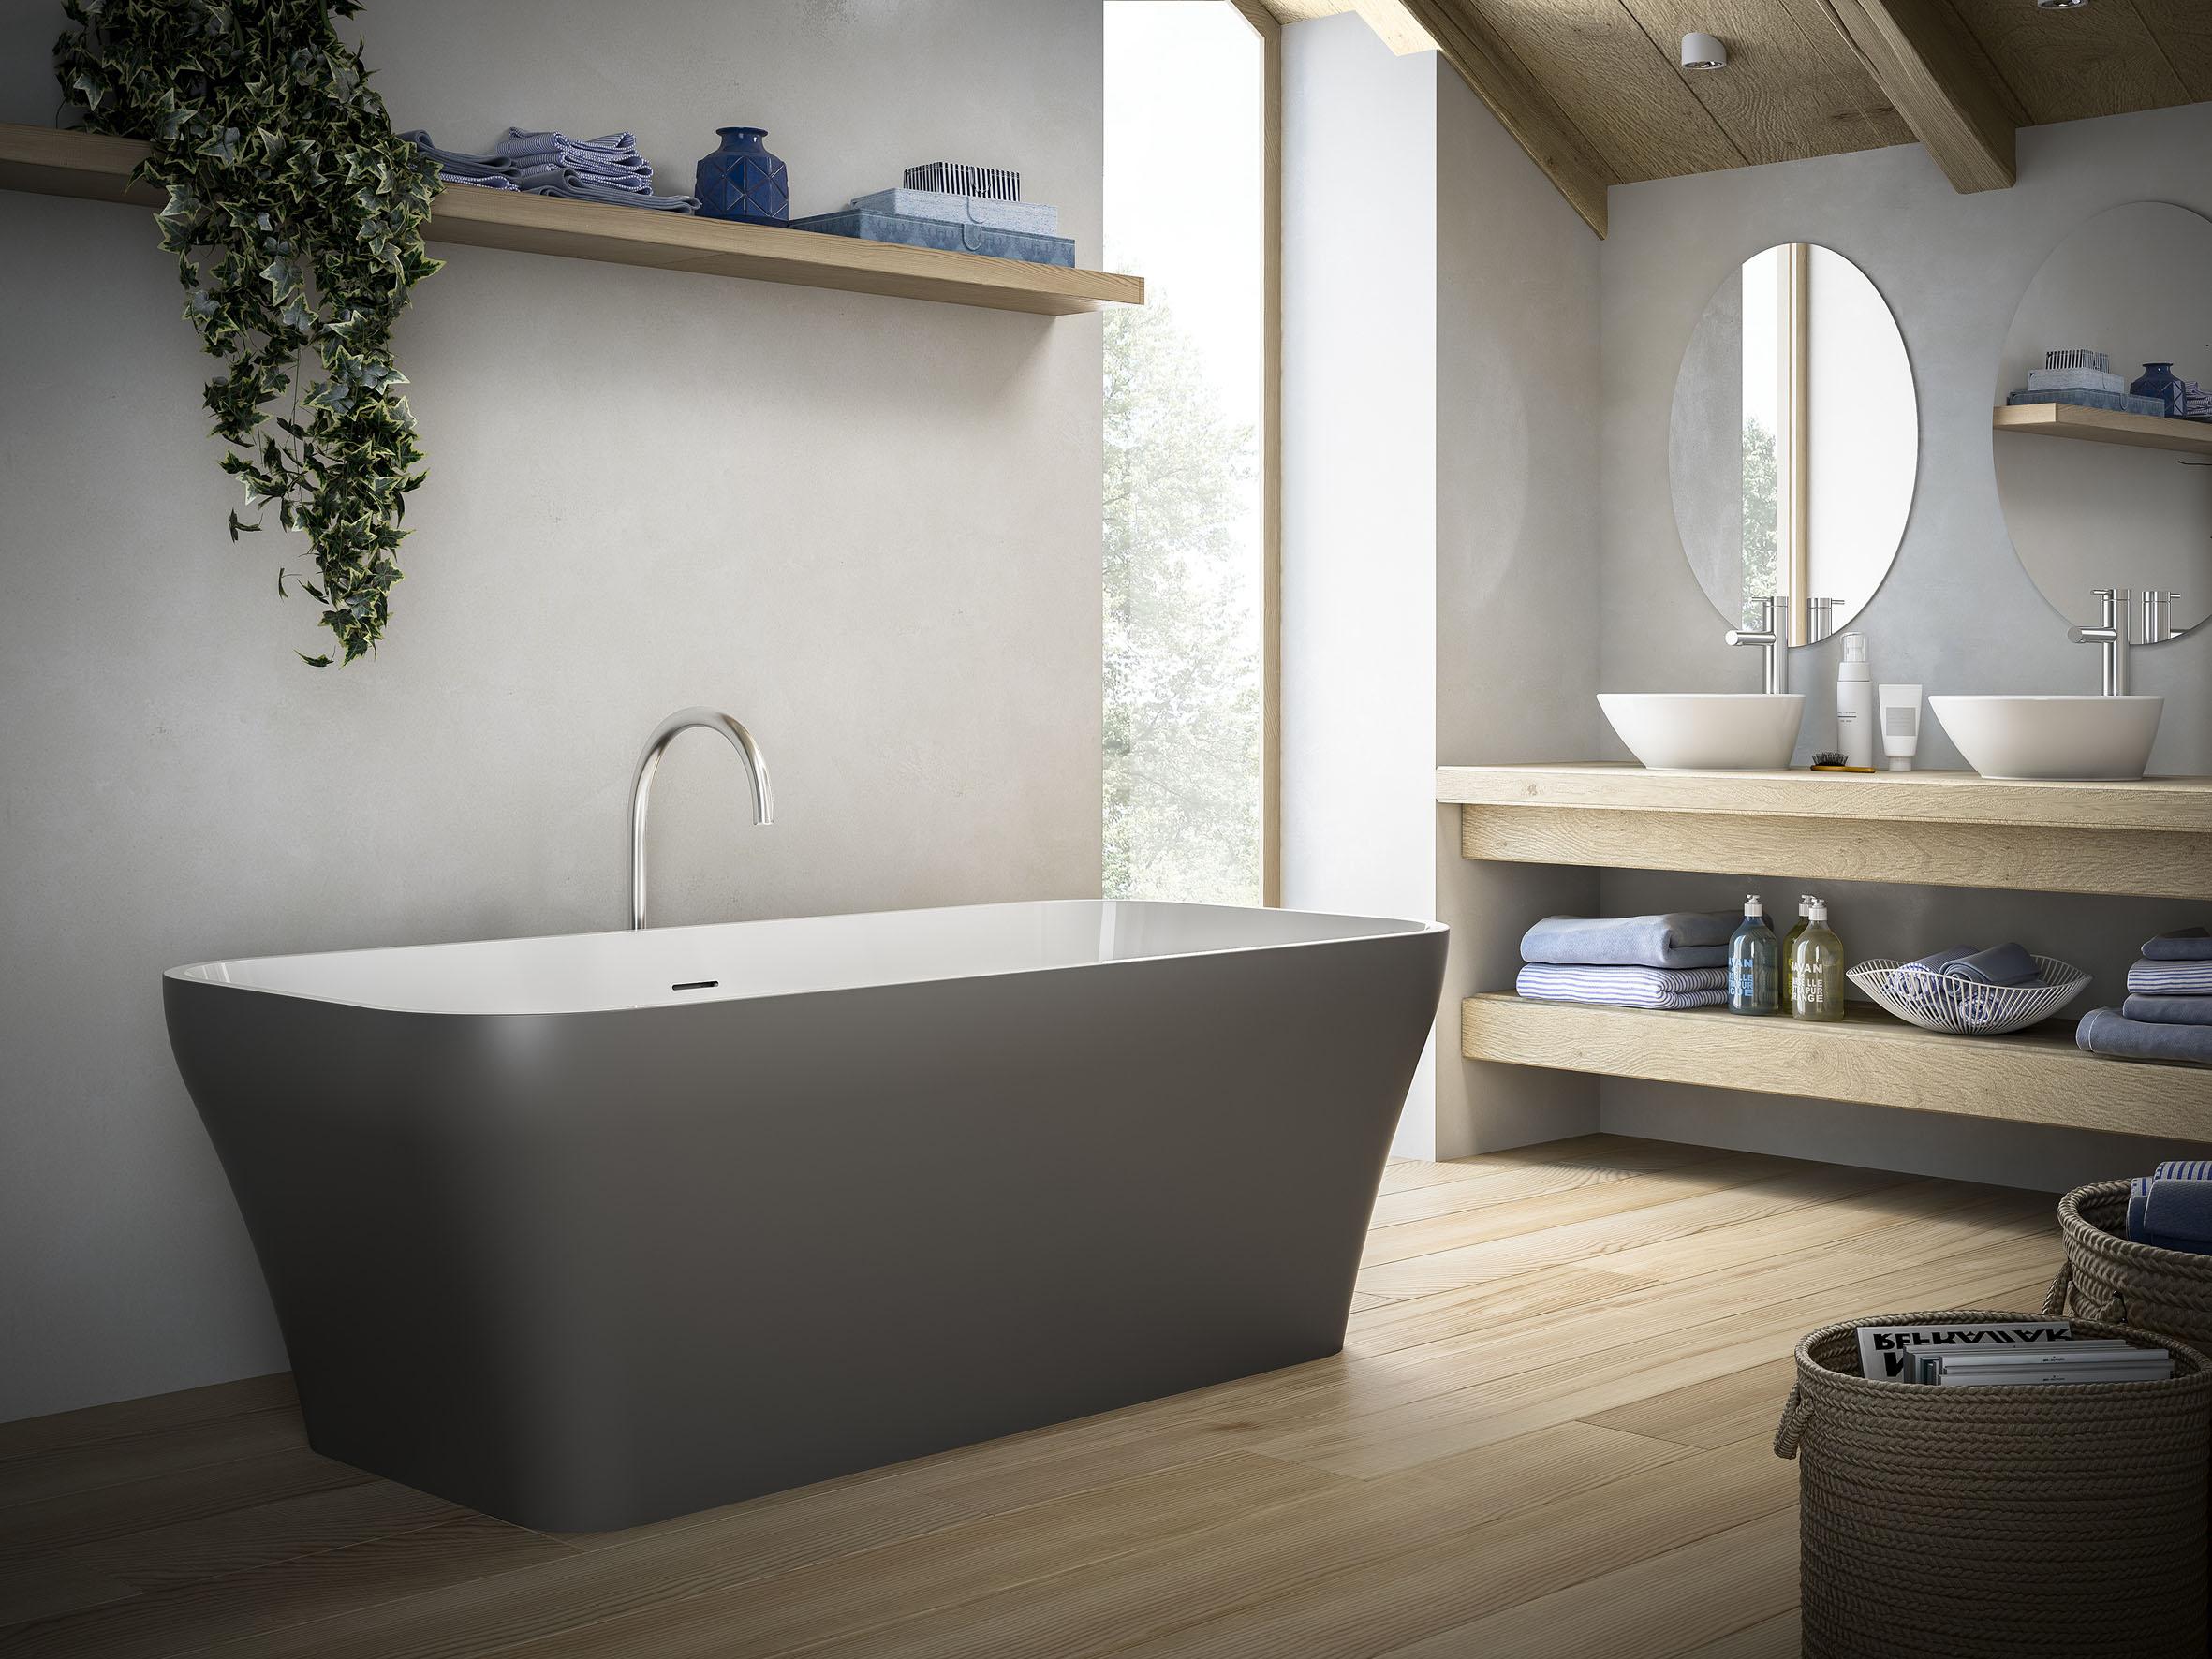 Vasca Da Bagno Galassia : Vasche: 5 soluzioni freestanding arredativo design magazine